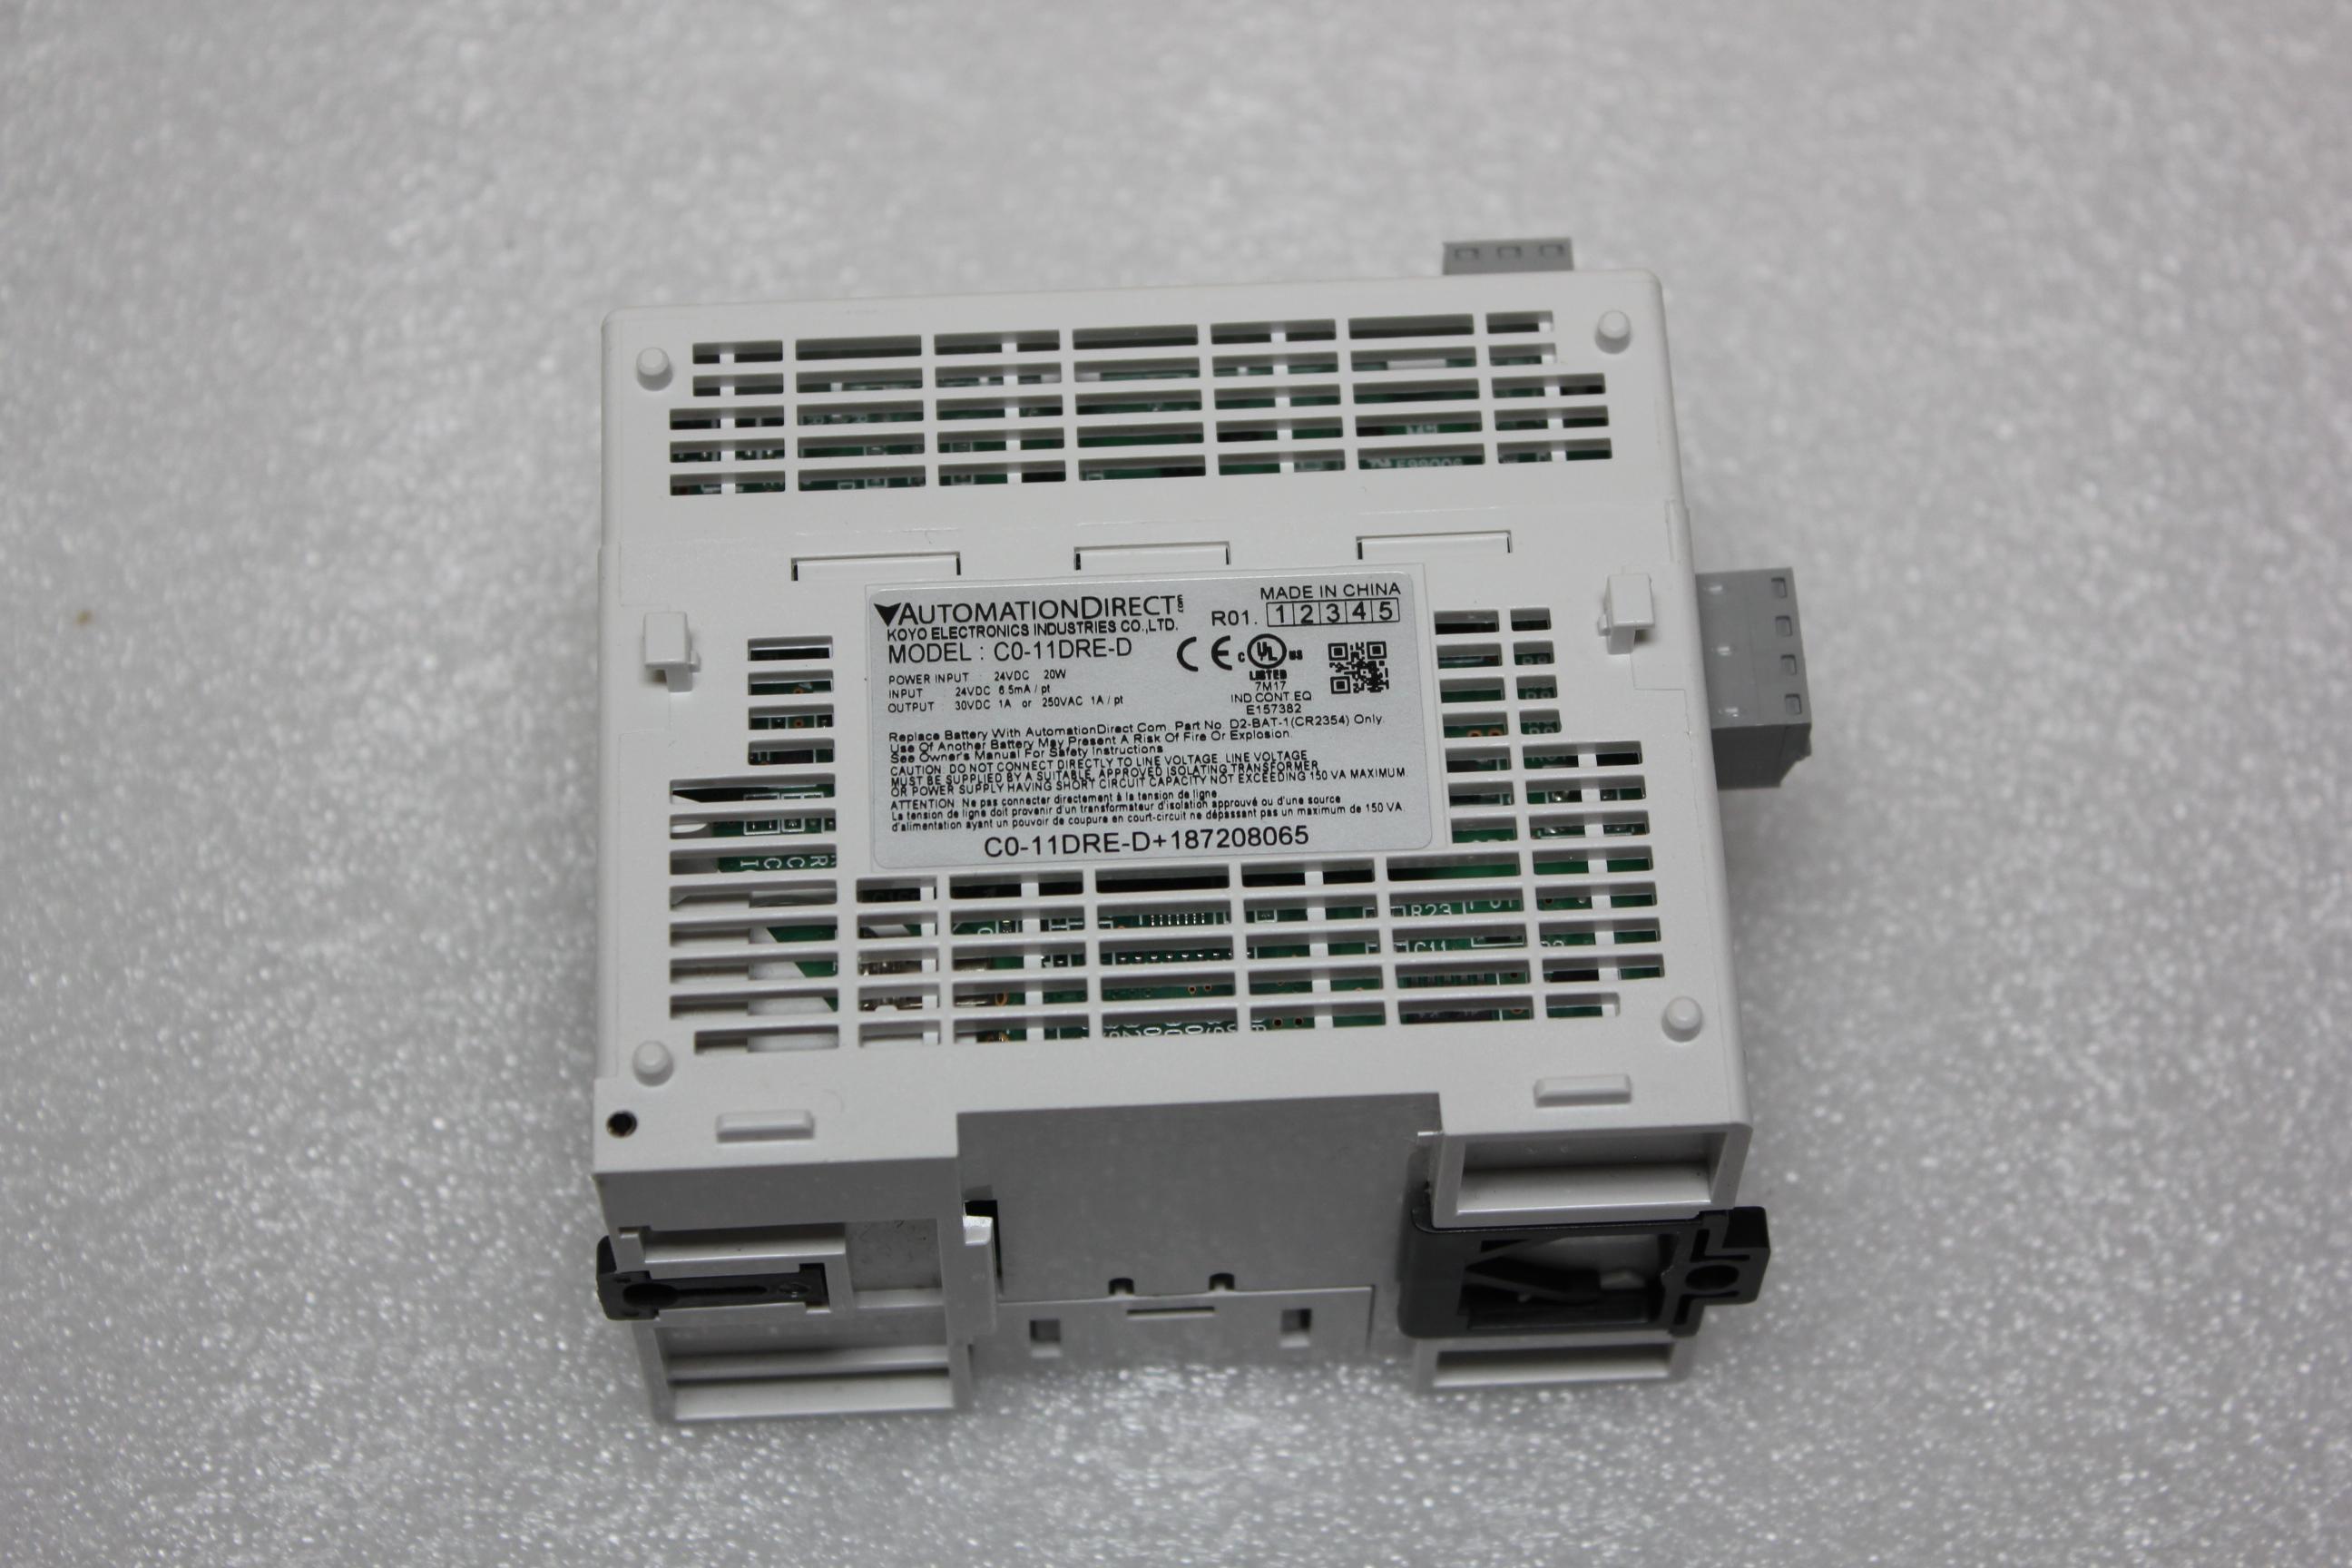 KOYO CLICK PLC ETHERNET MODULE - Image 2 of 2